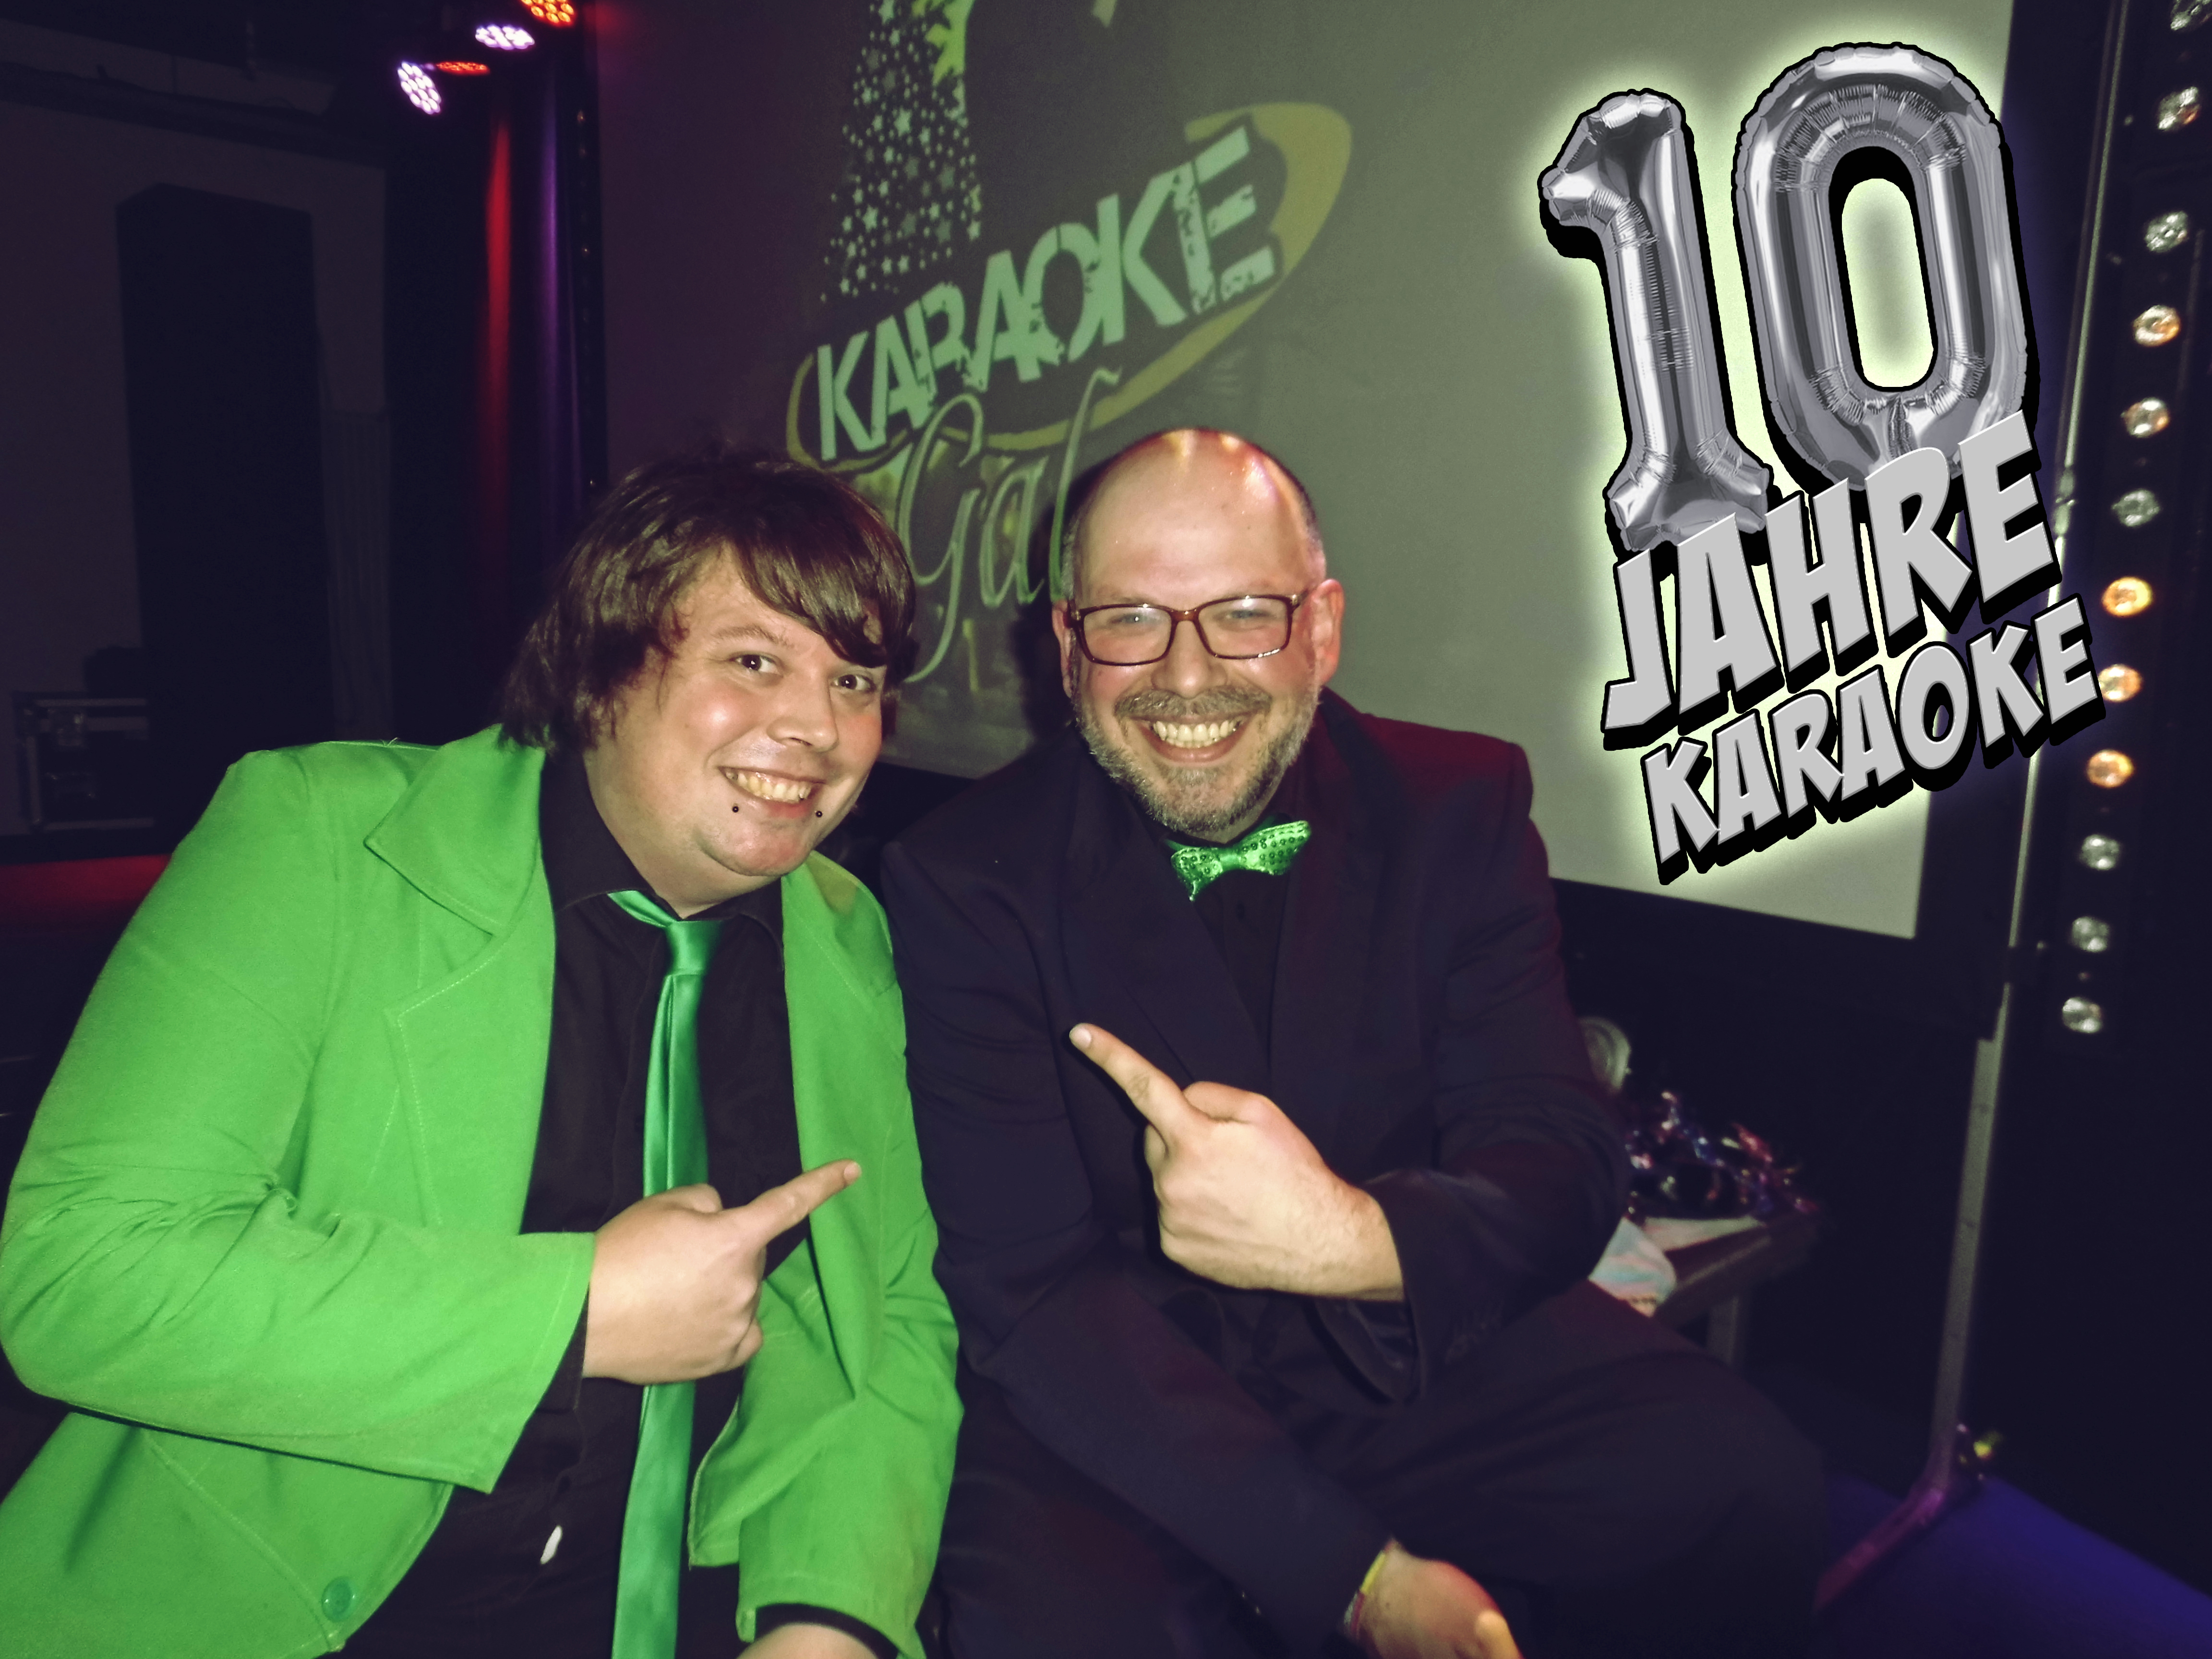 Karaoke-Jubiläums-Gala mit den Höckelmännern!